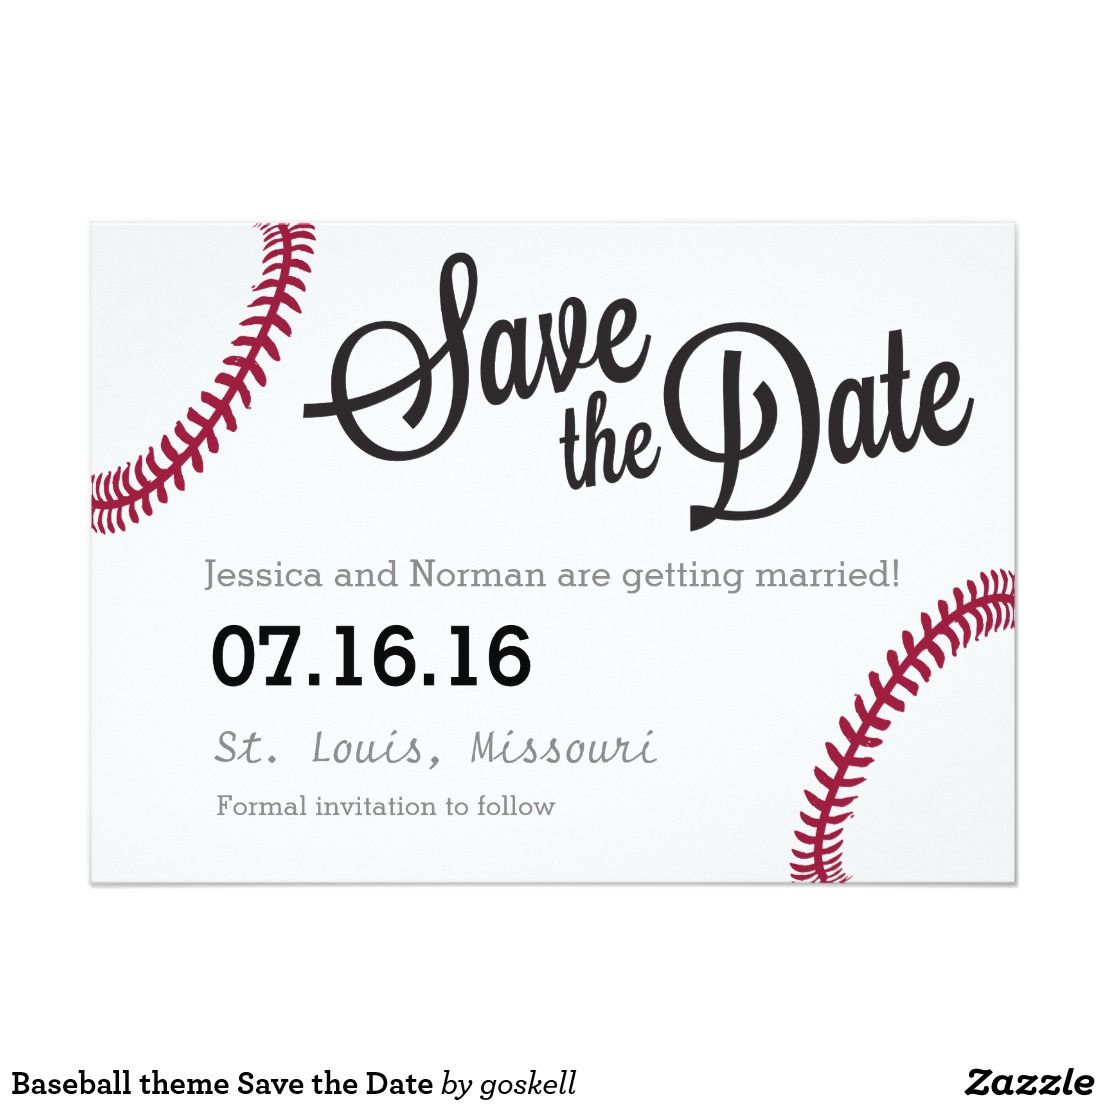 Baseball theme Save the Date Card | Baseball | Pinterest